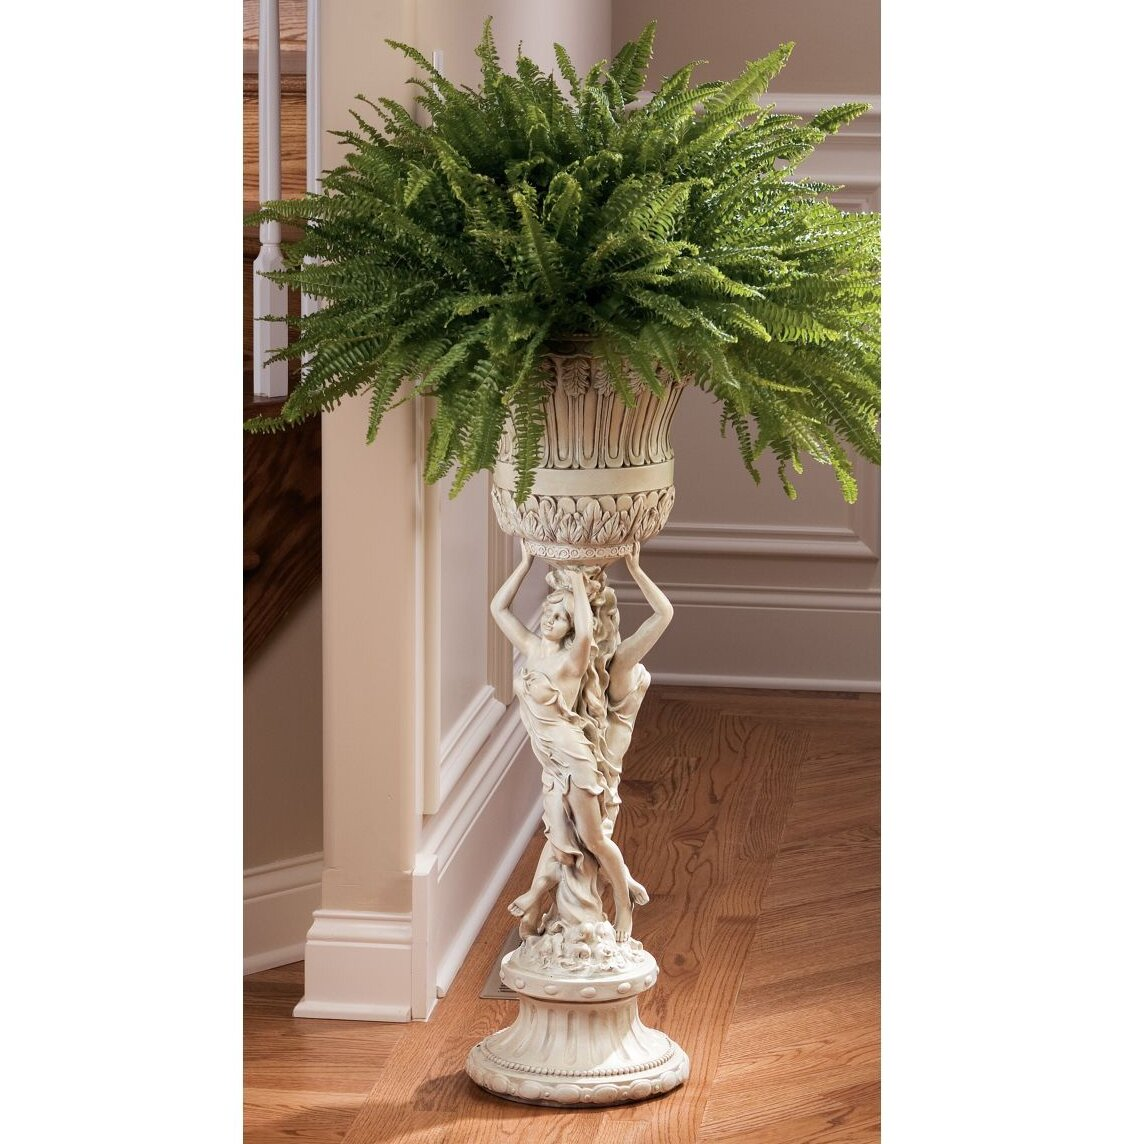 Les Filles Joyeuses Neoclassical Pedestal Plant Stand